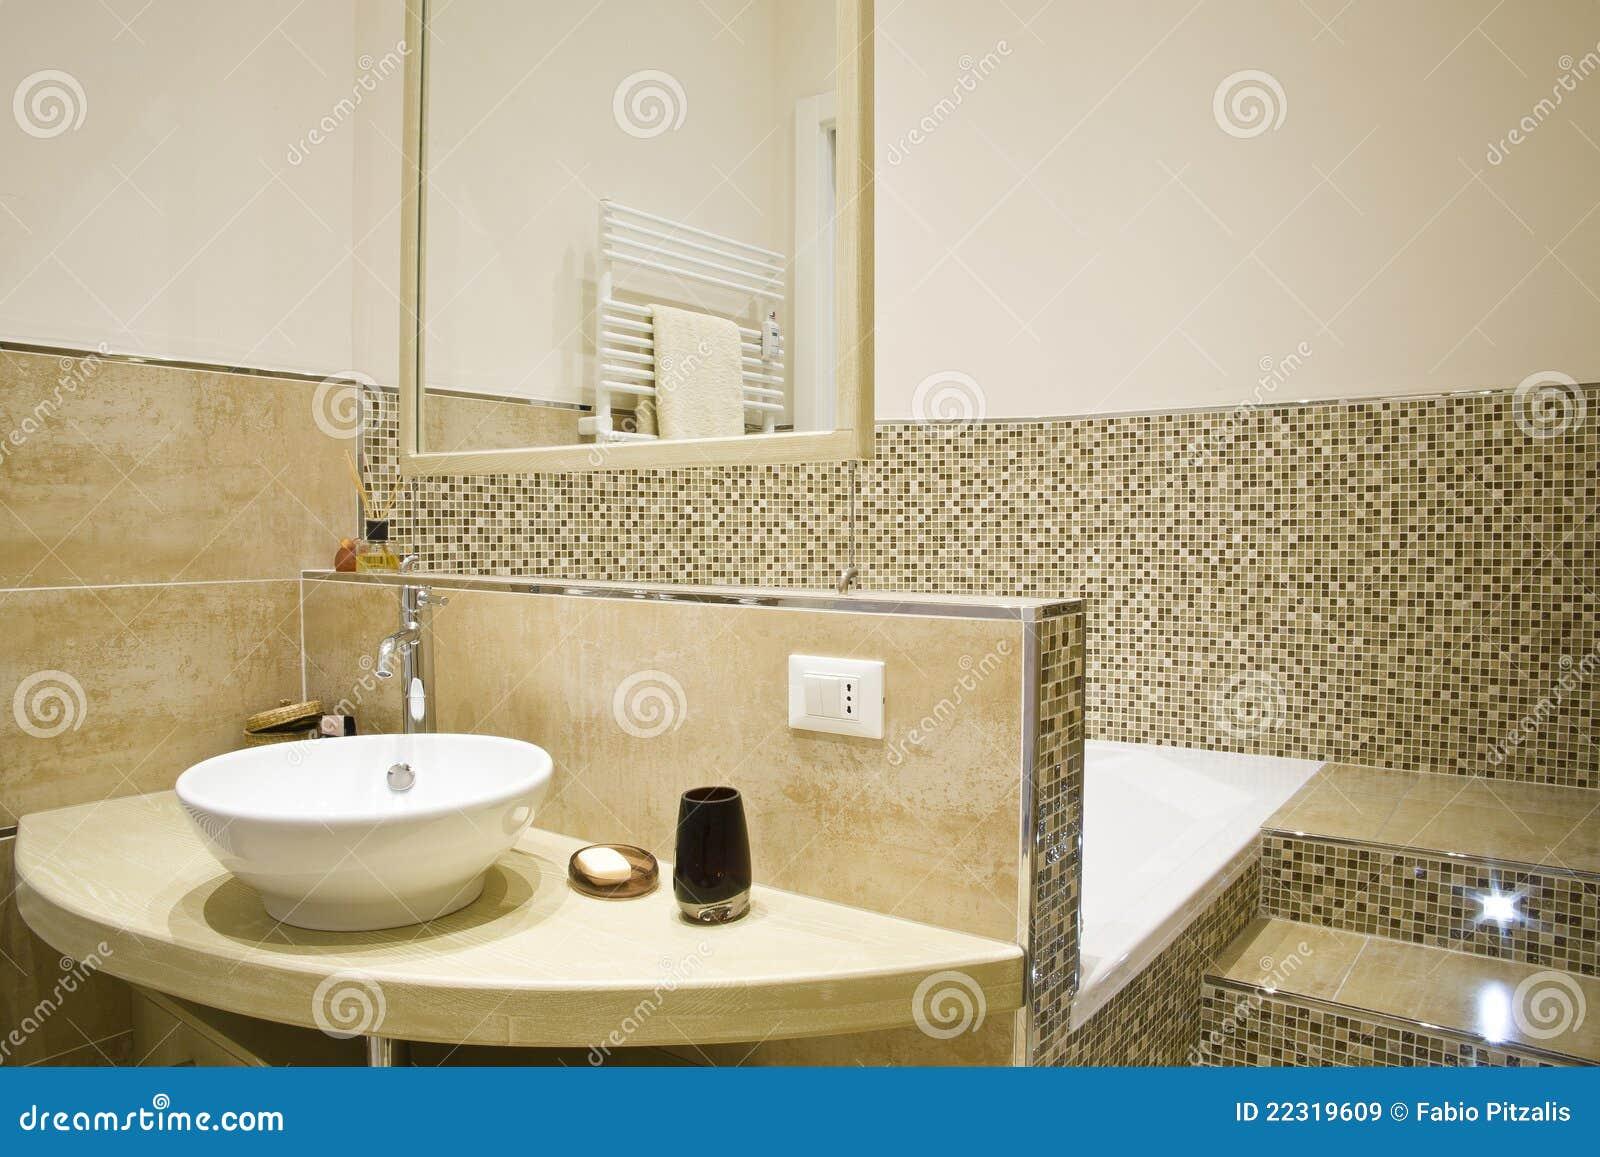 Significato Di Vasca Da Bagno In Inglese : Sognare vasca da bagno vasca da bagno bassa vasca da bagno libra